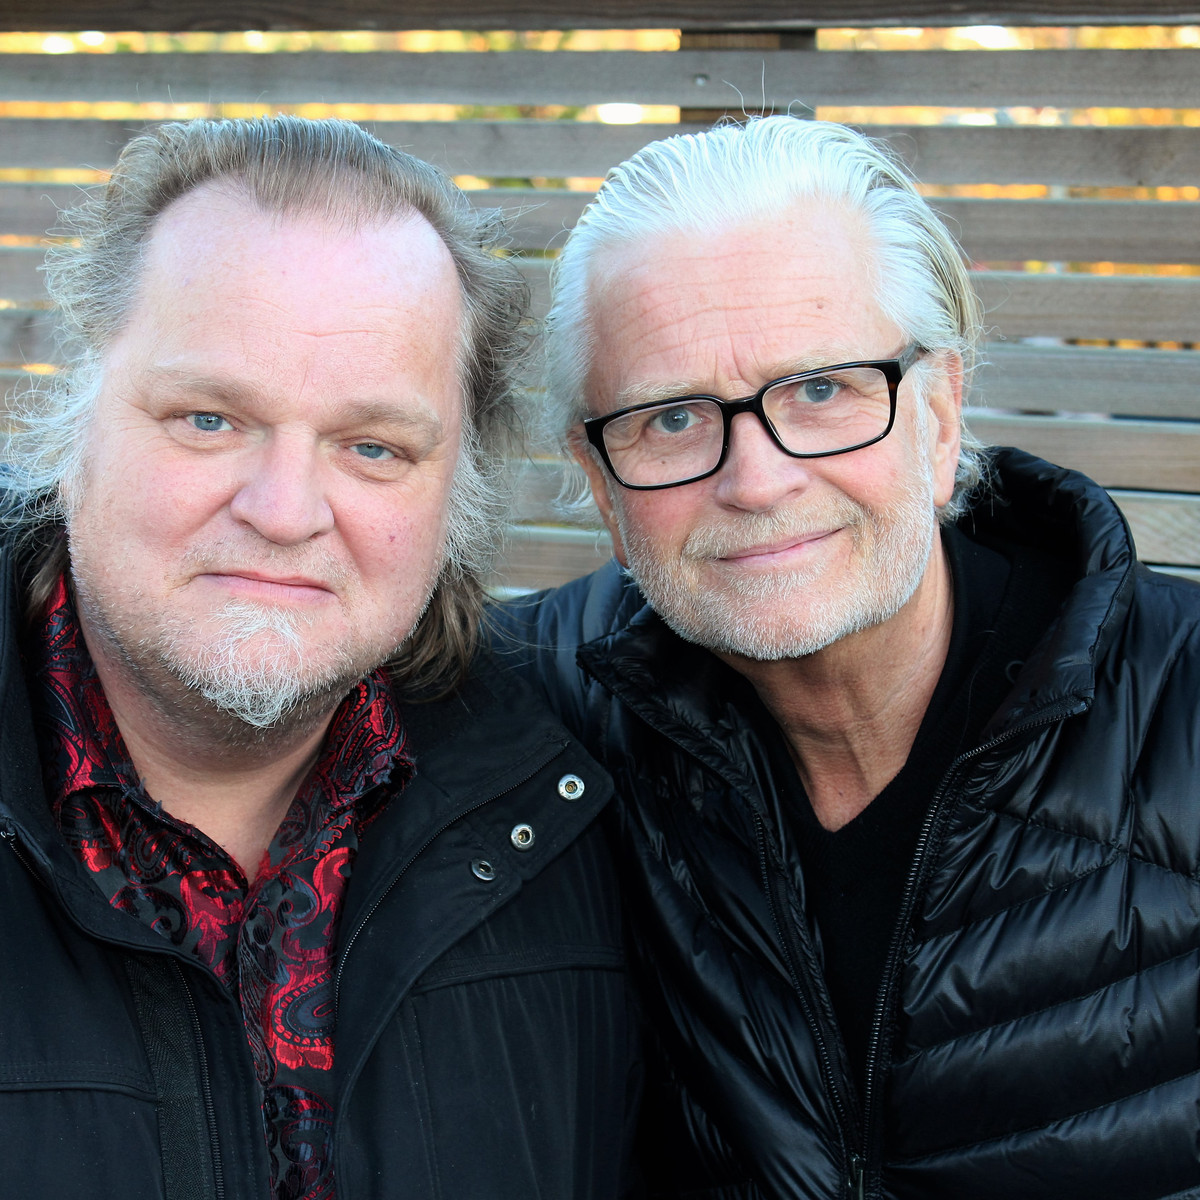 Blå Koral:Knut Reiersrud og Iver Kleive